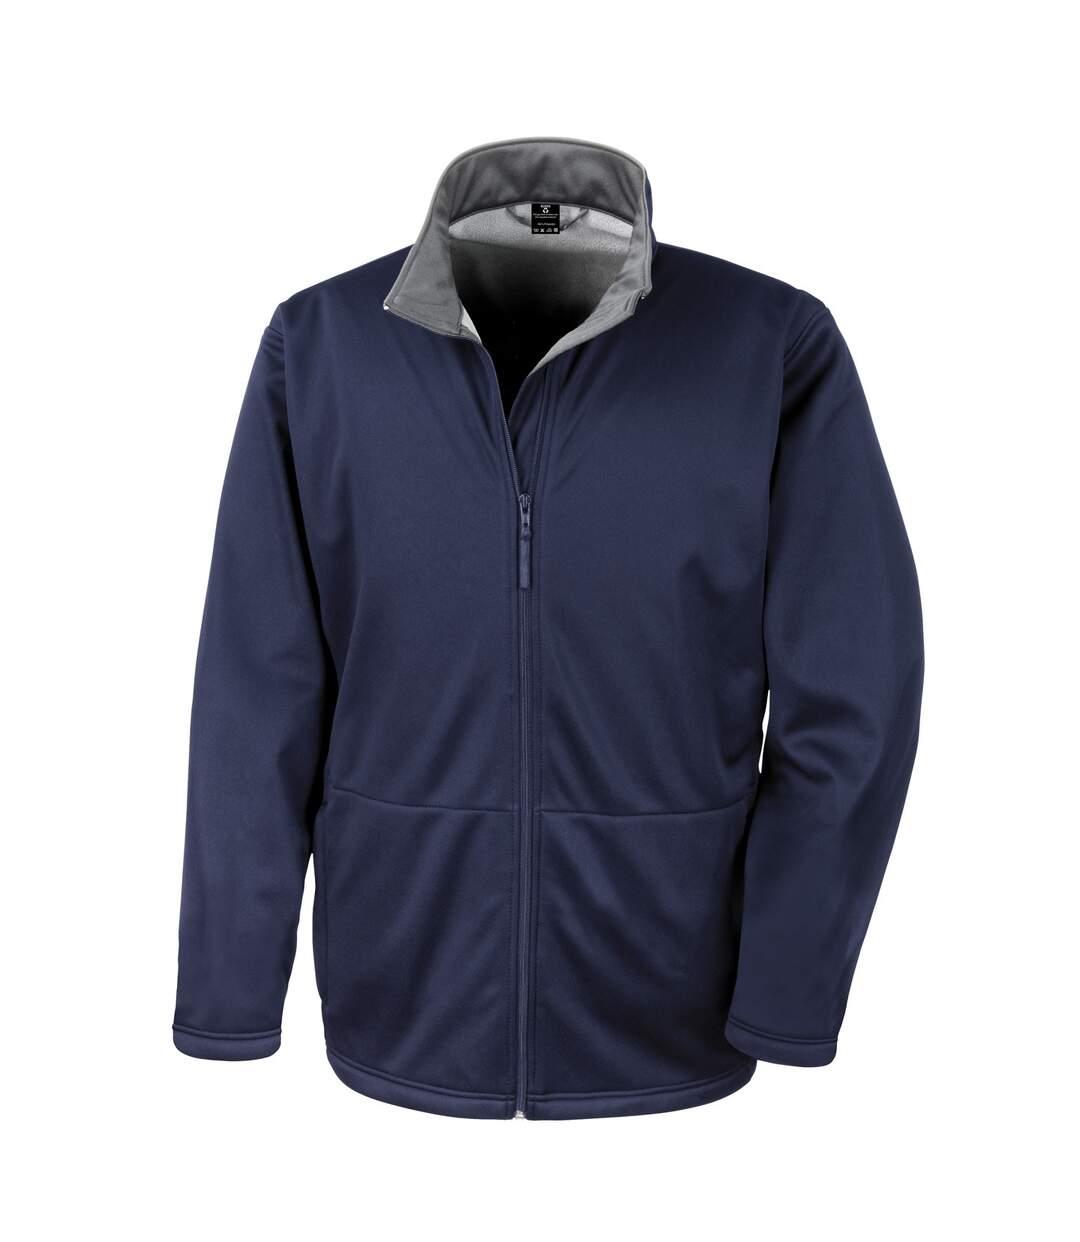 Result Core Mens Soft Shell 3 Layer Waterproof Jacket (Black) - UTBC904